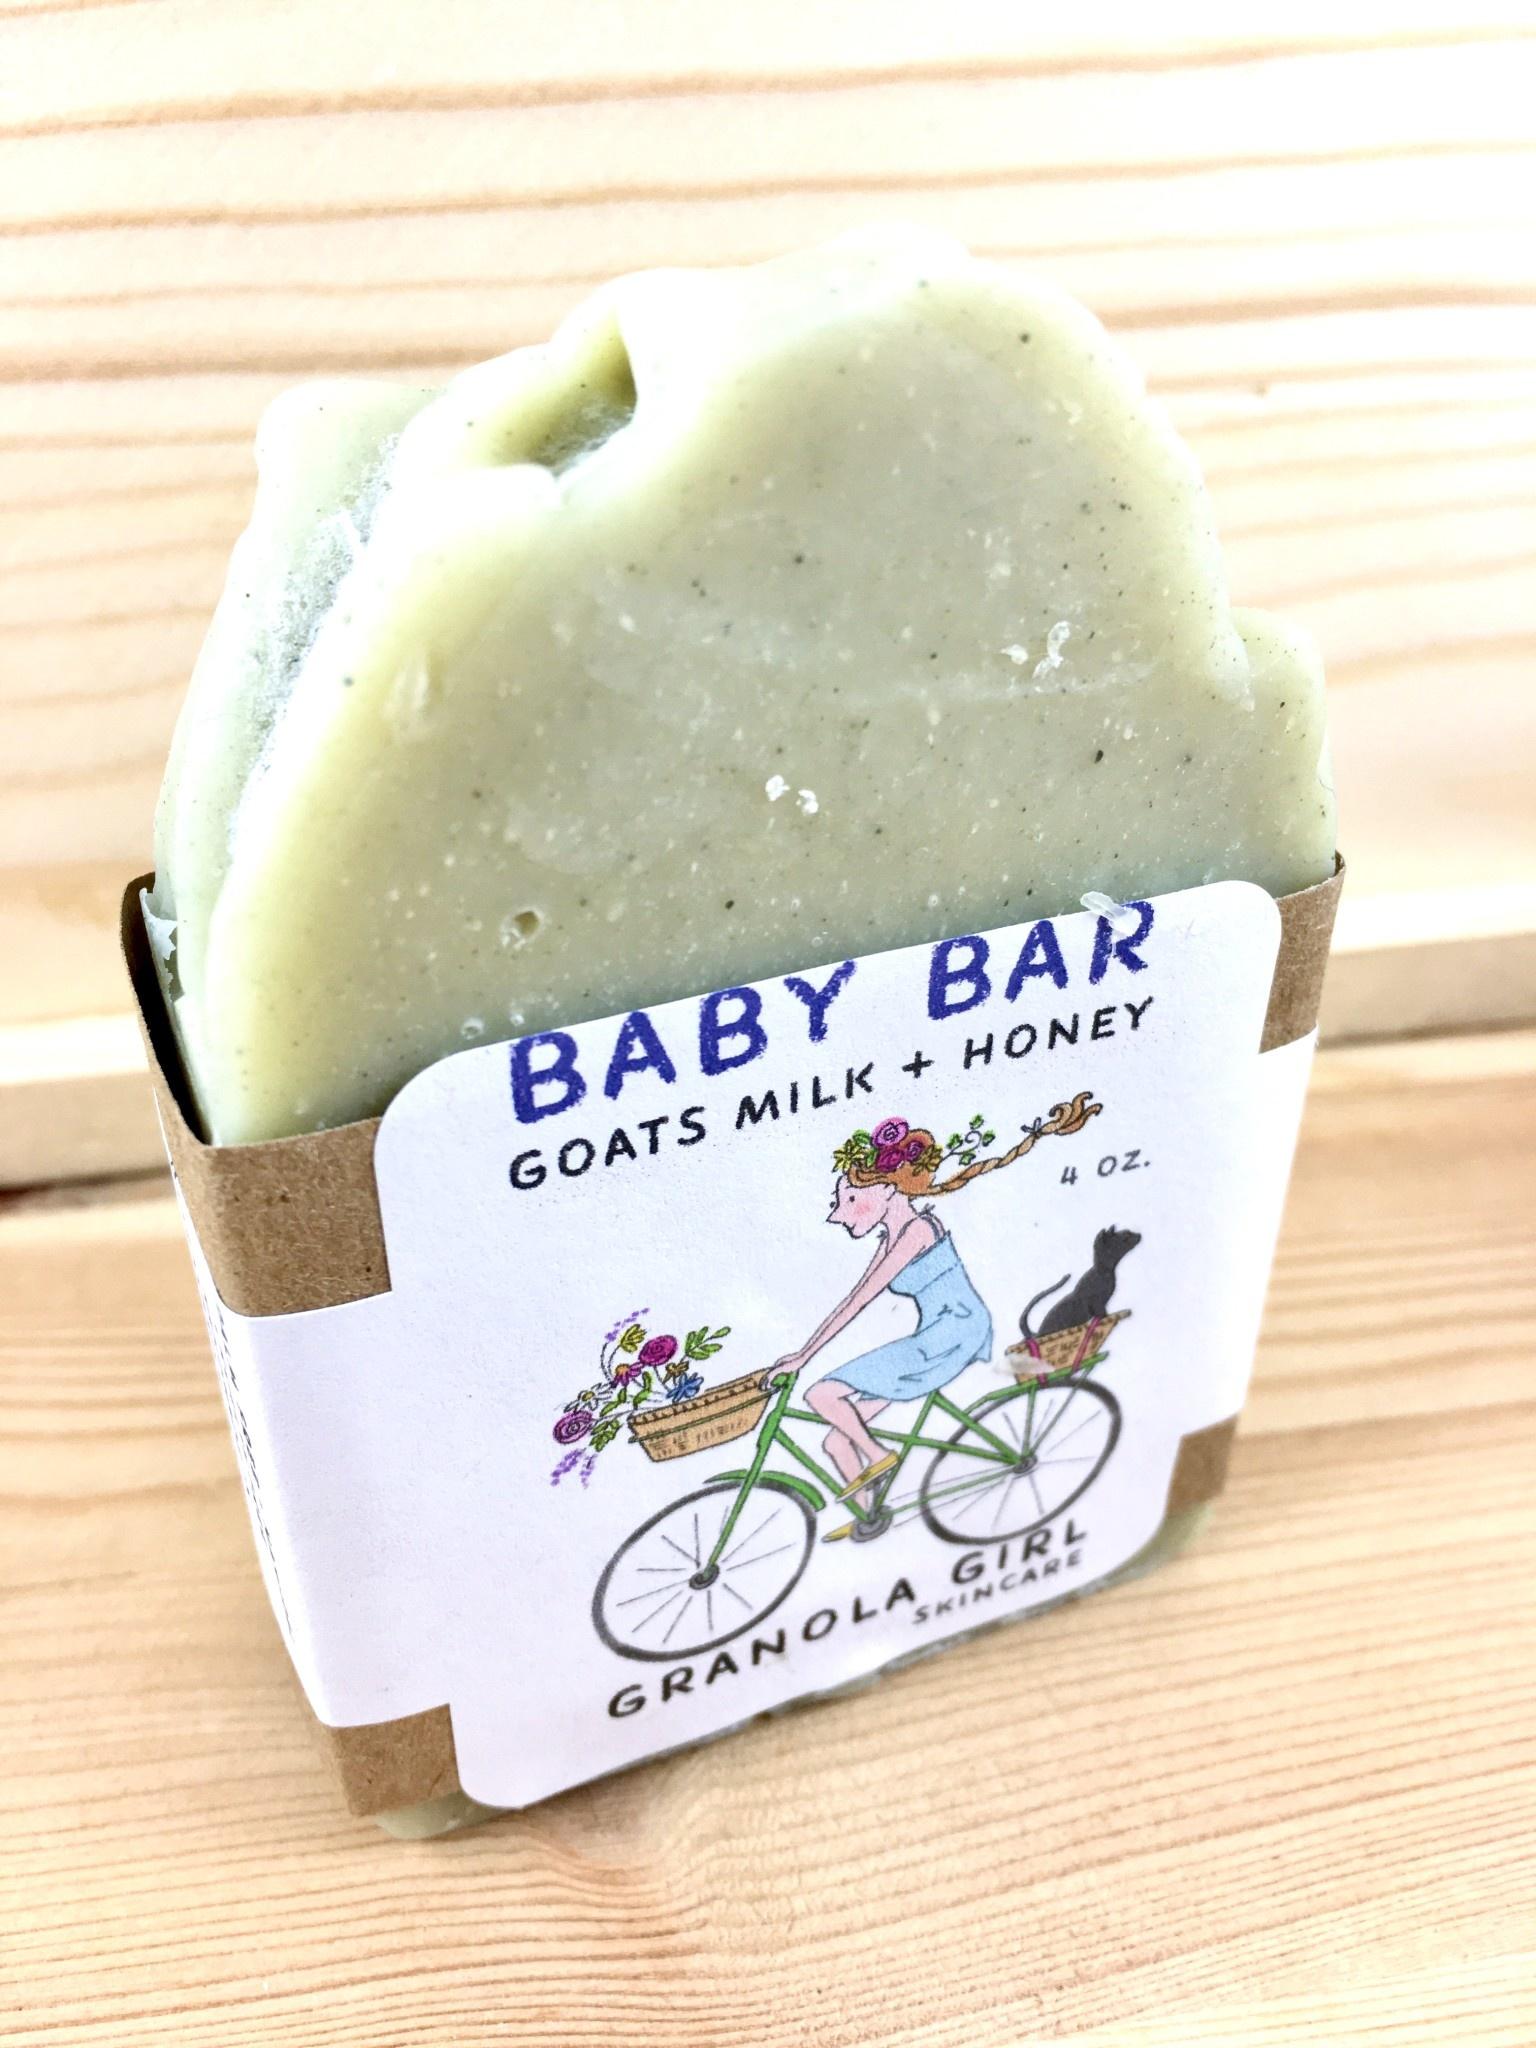 Granola Girl Skincare /Teehaus Bath + Body Baby Bar - Goat's Milk + Honey Soap